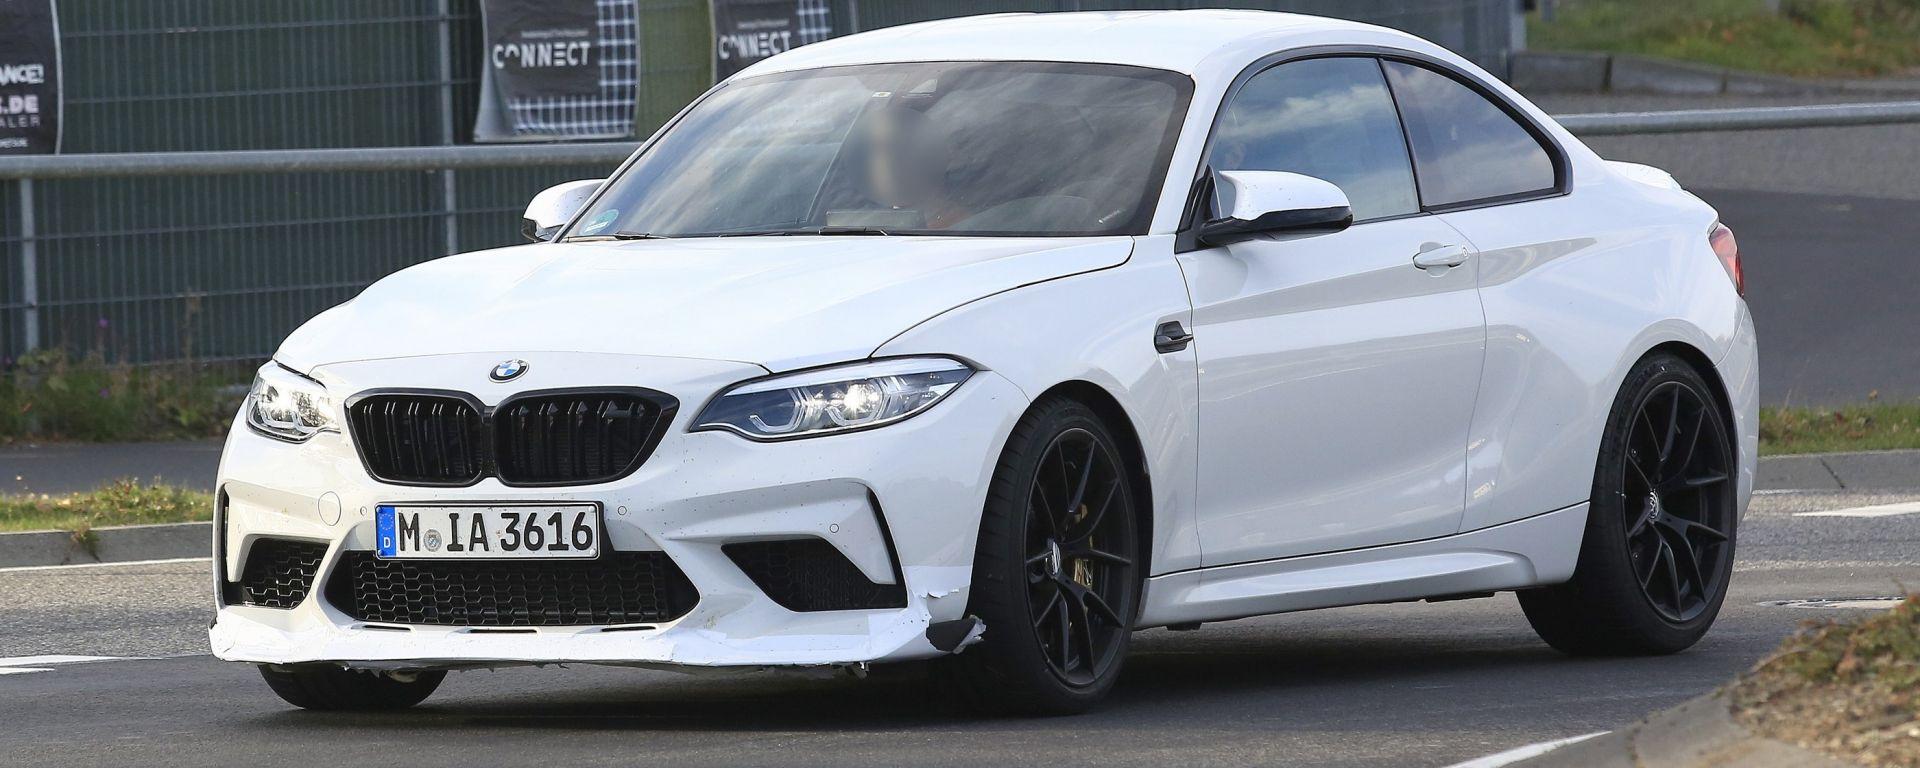 BMW M2, avvistamenti al Ring: sarà la nuova CS o CSL